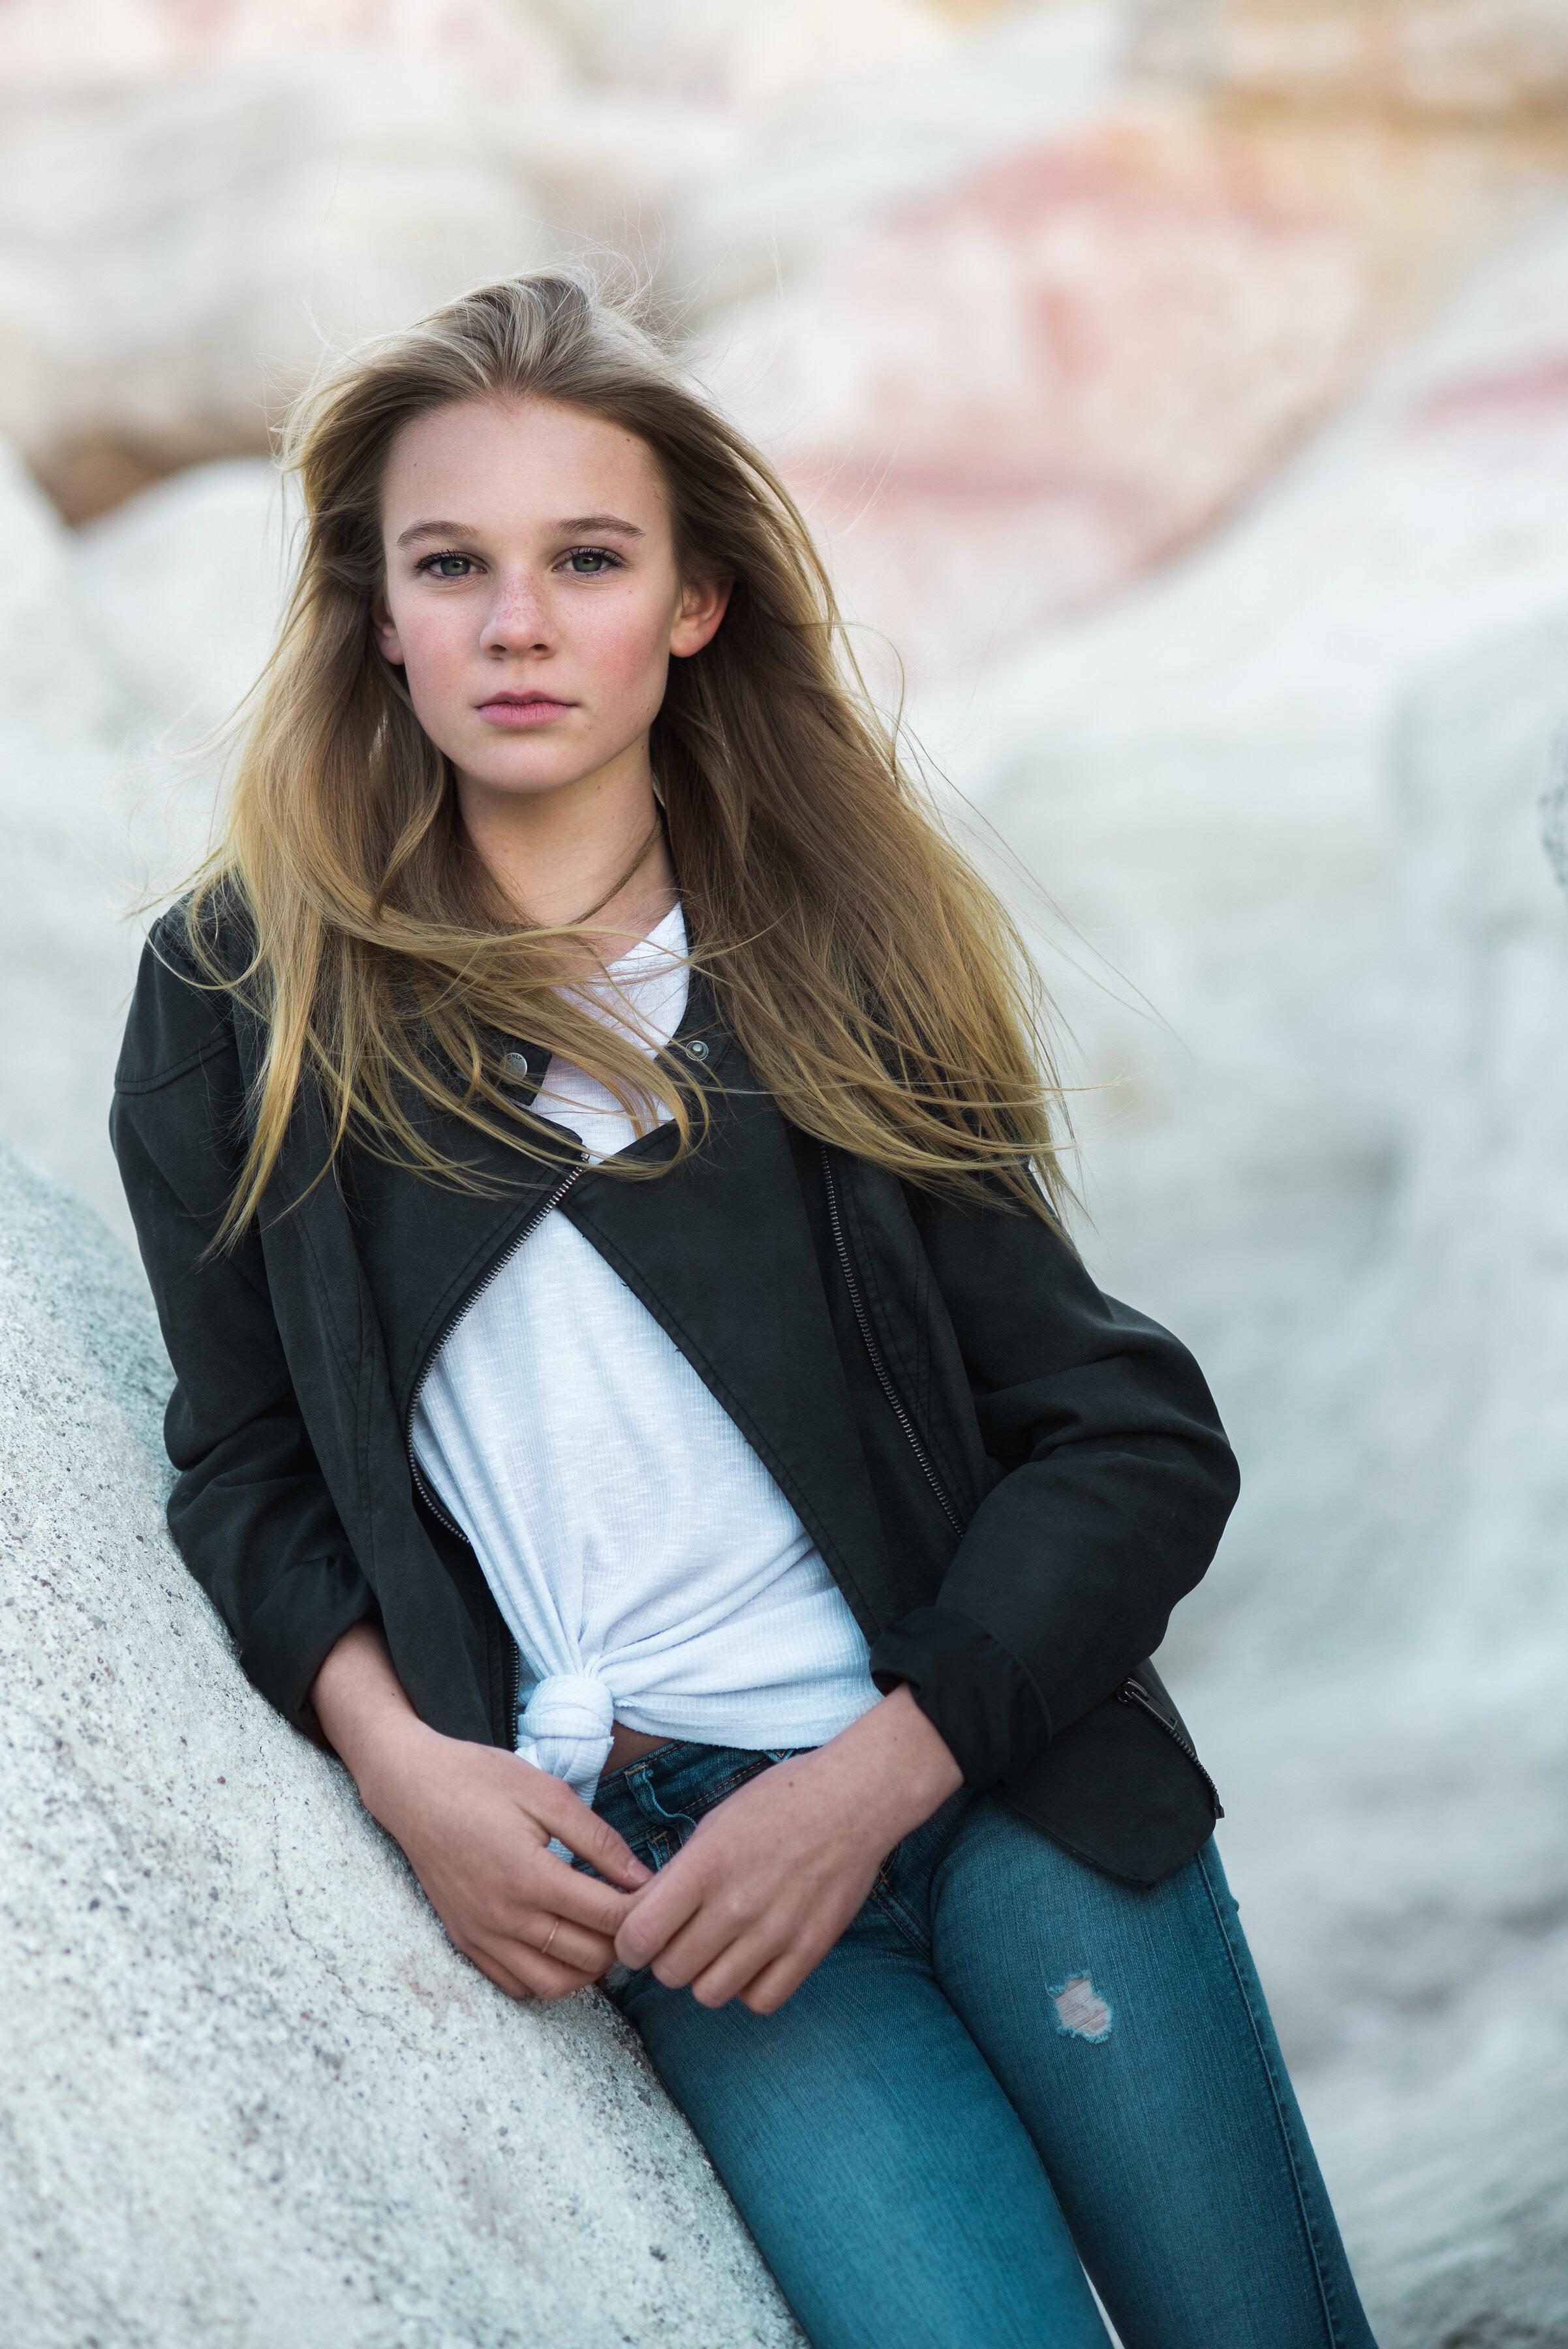 Teen Modeling Headshots Denver